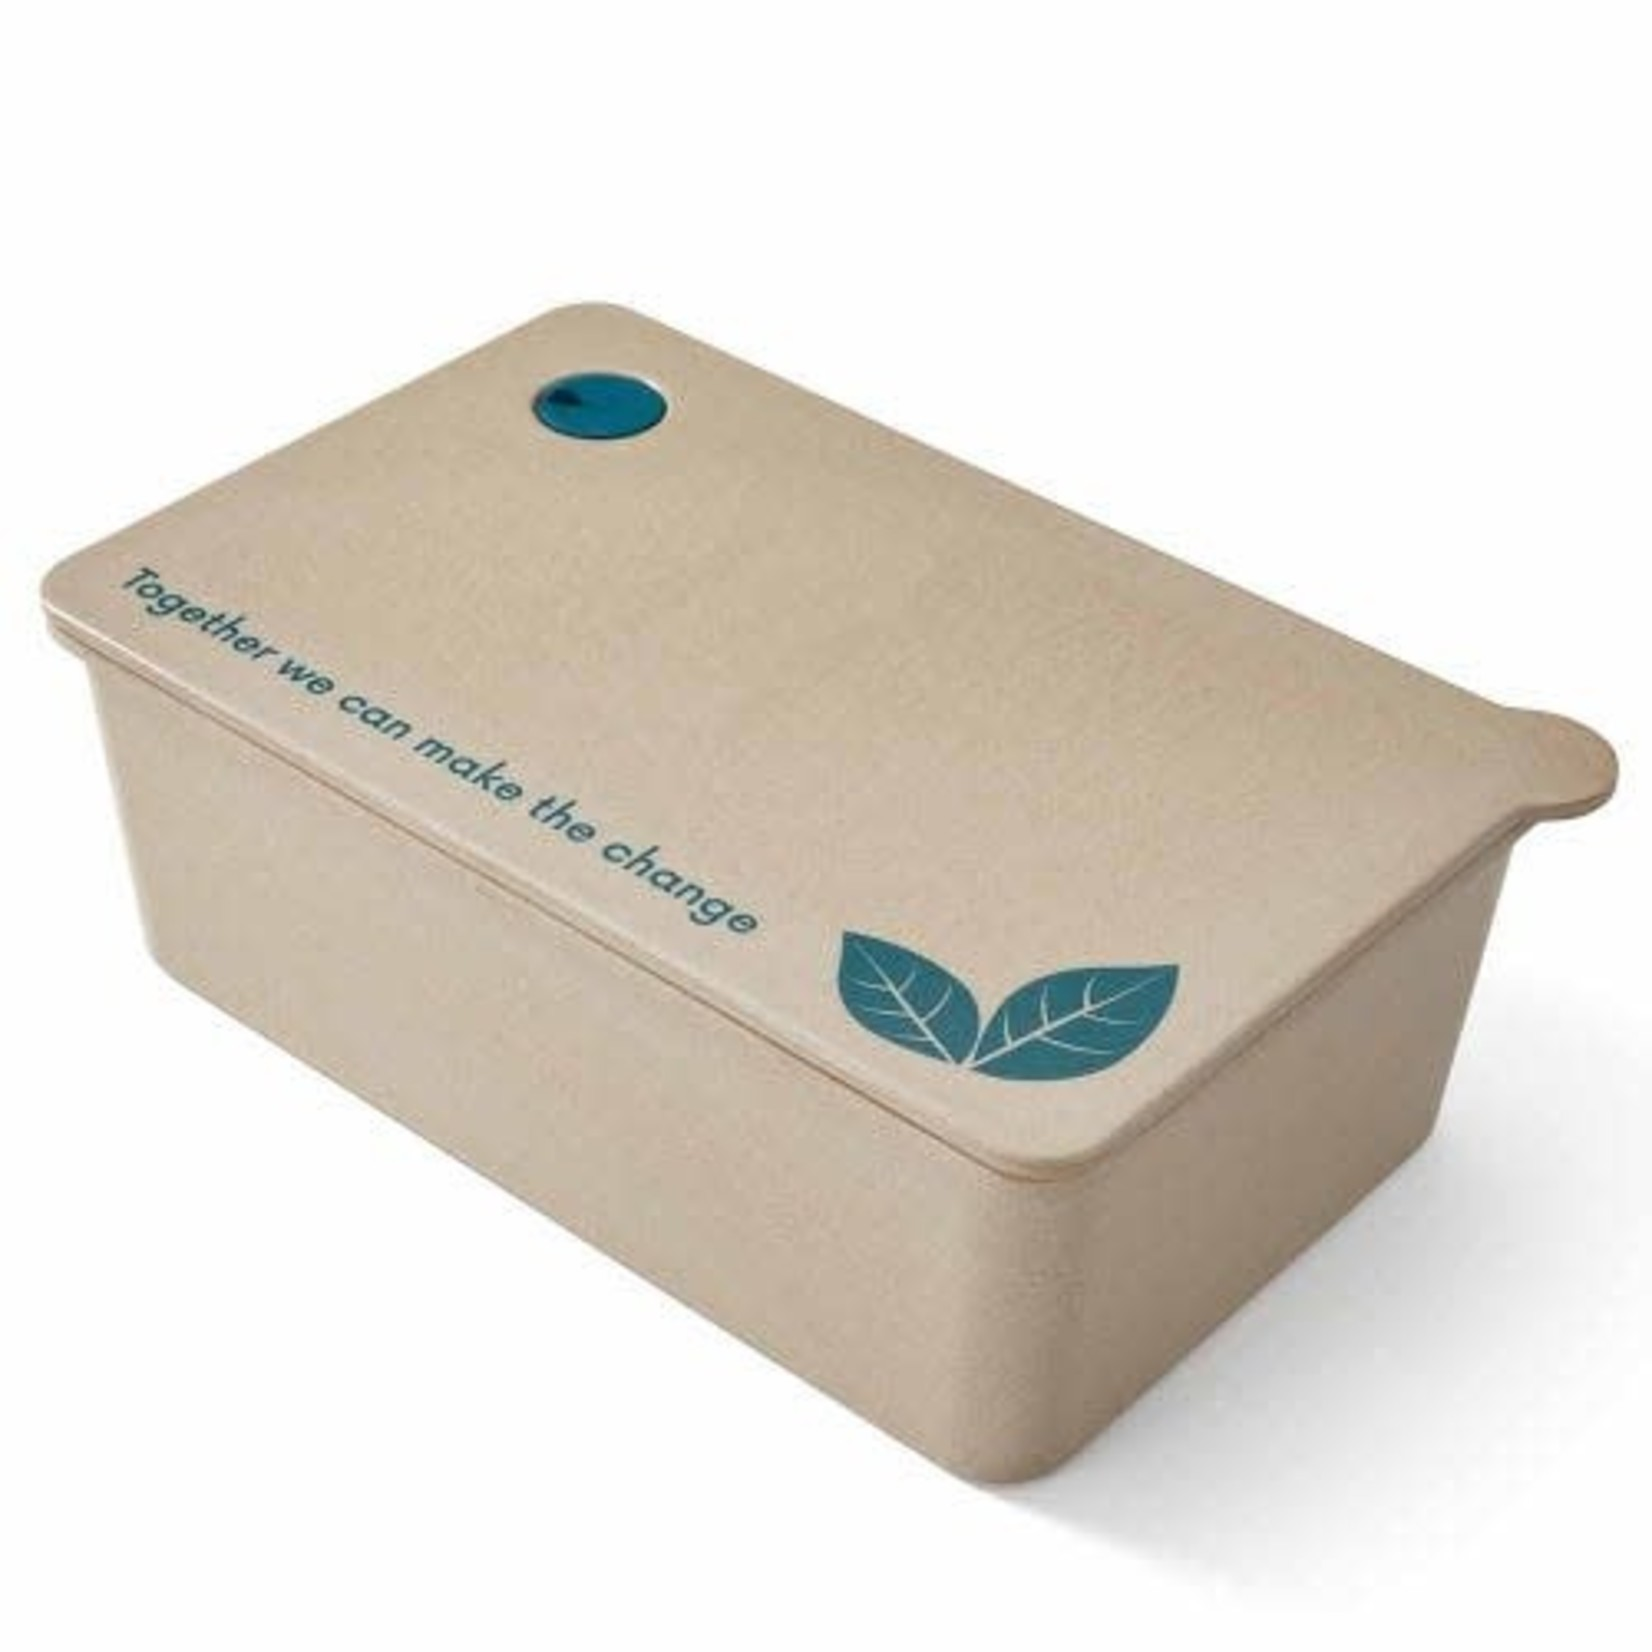 EcoSoulife EcoSoulife Rice Husk Takeaway Box